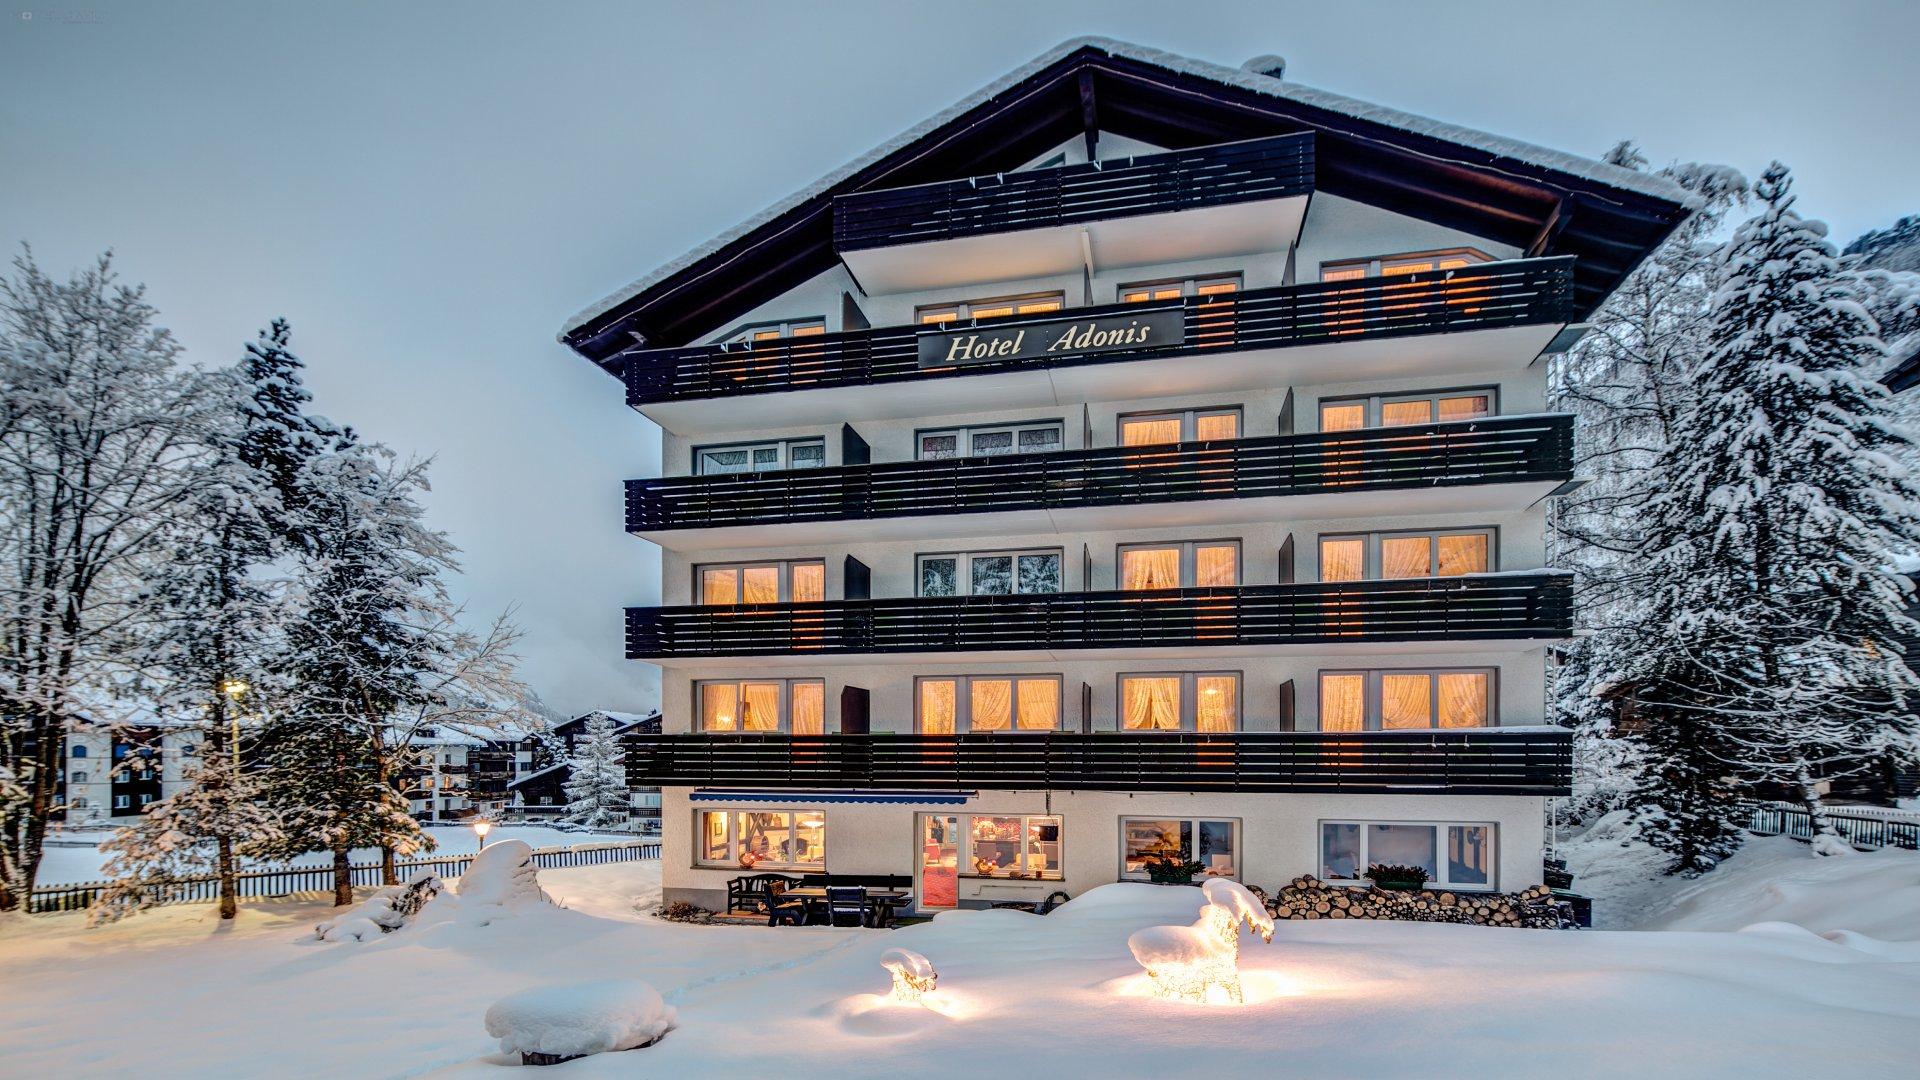 Hotel Adonis 0